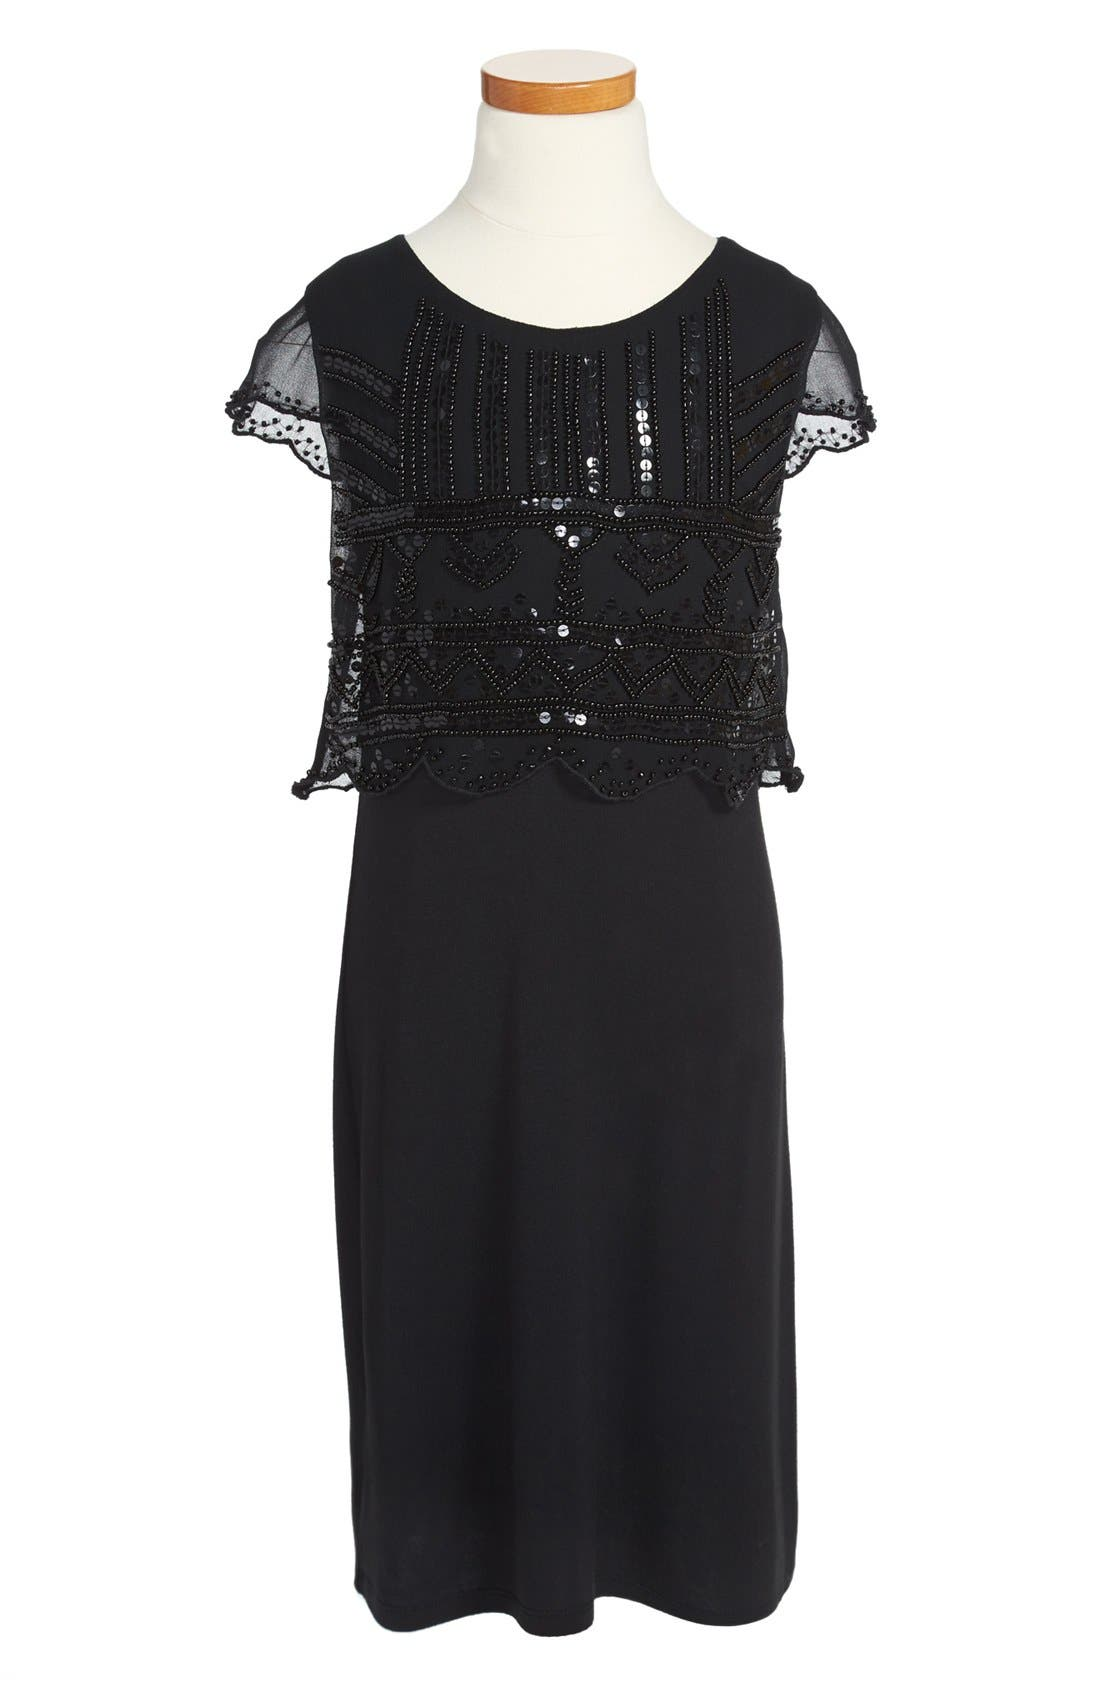 Alternate Image 1 Selected - Sally Miller Beaded Dress (Big Girls)